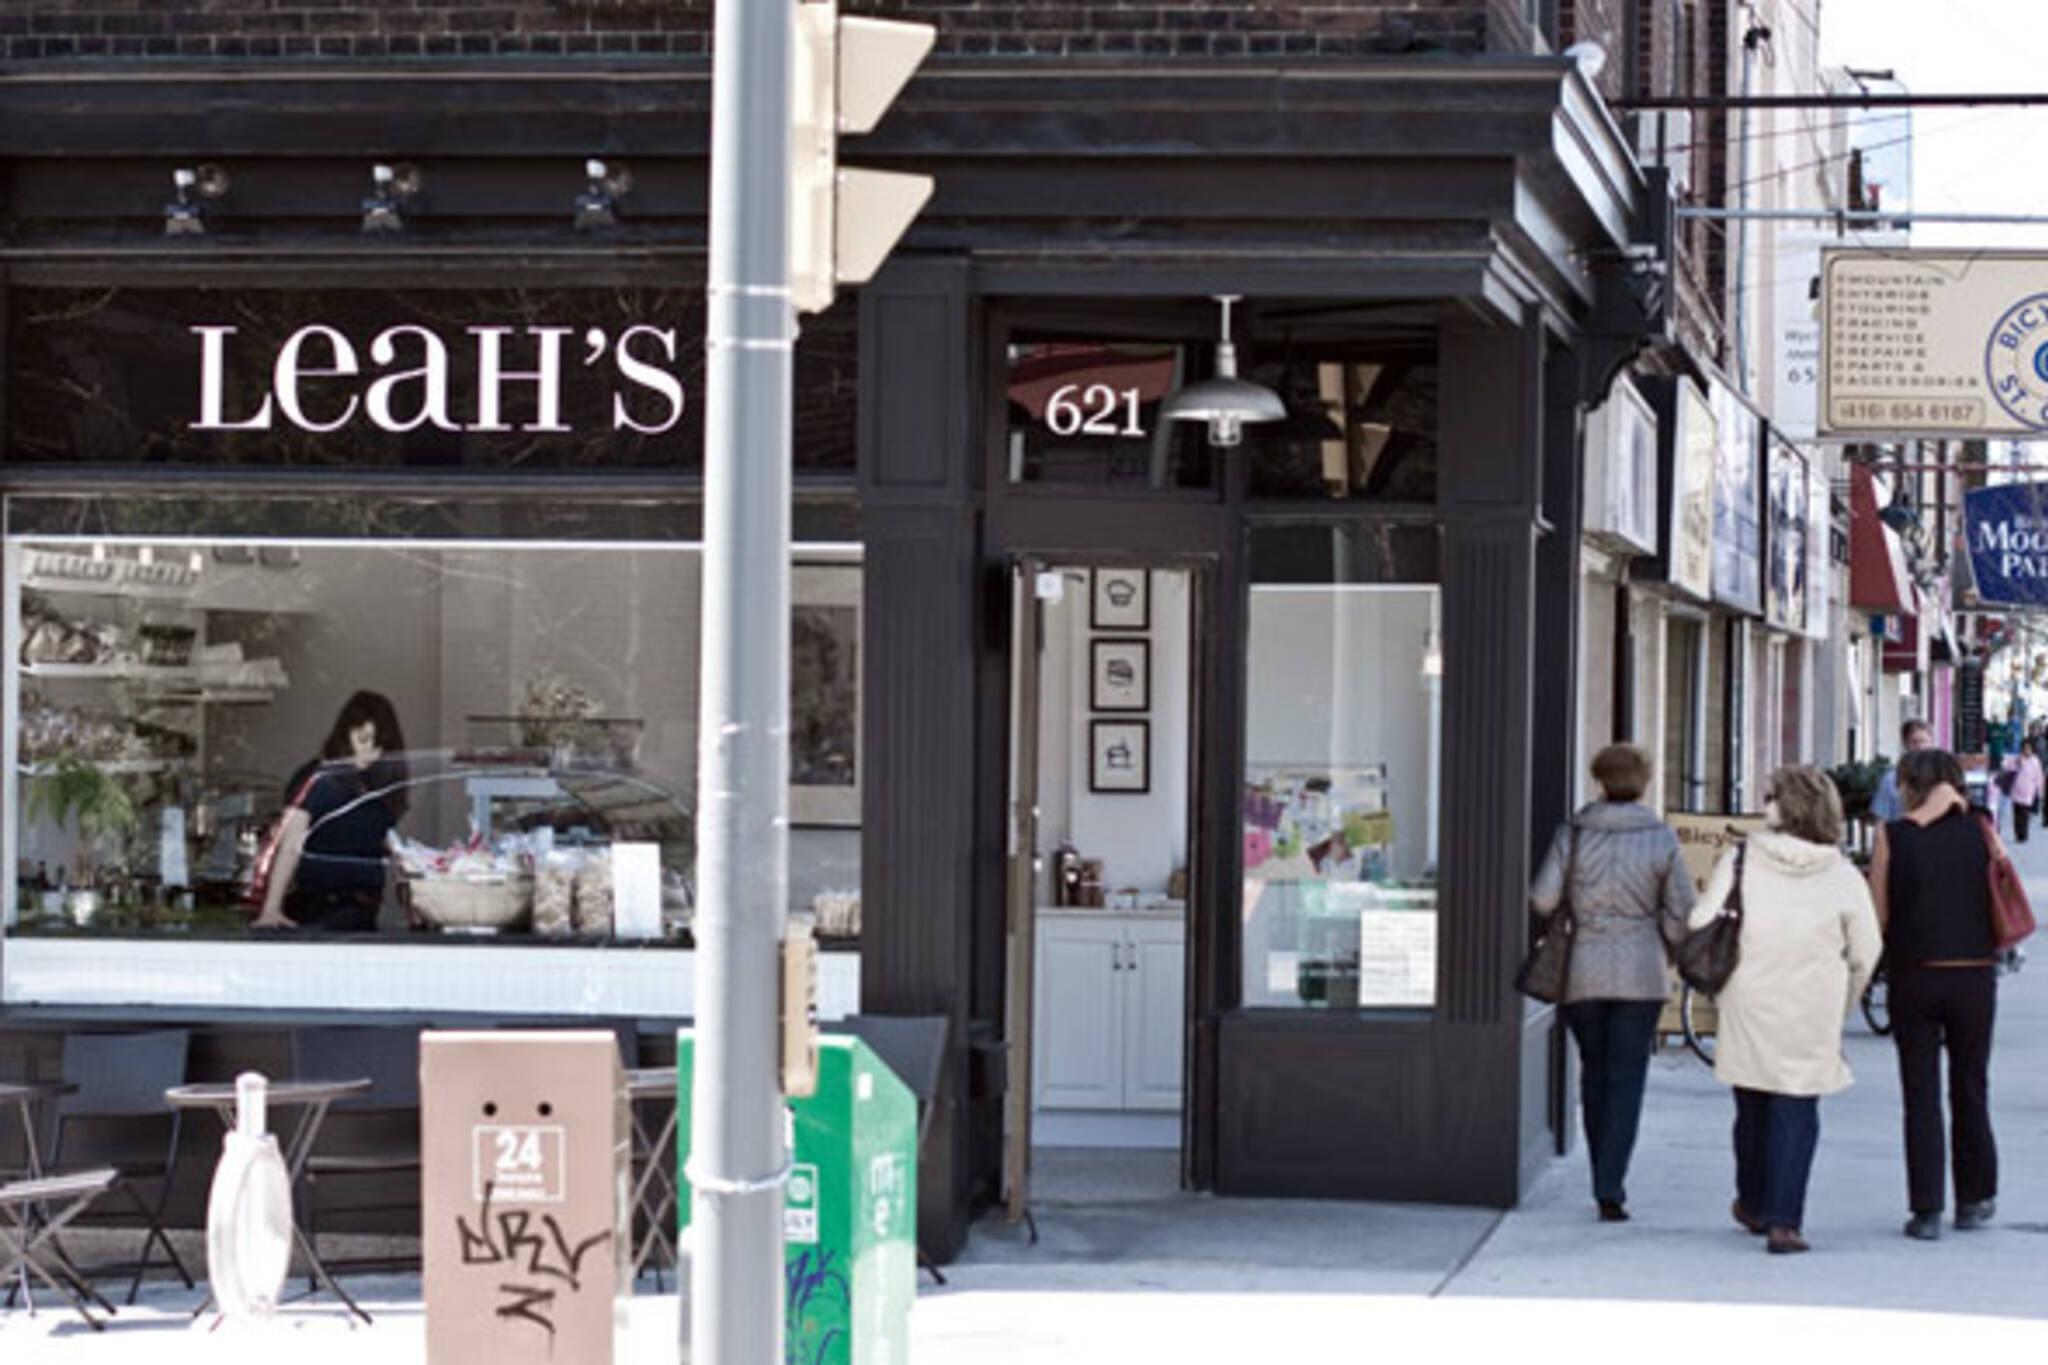 Leah's Toronto